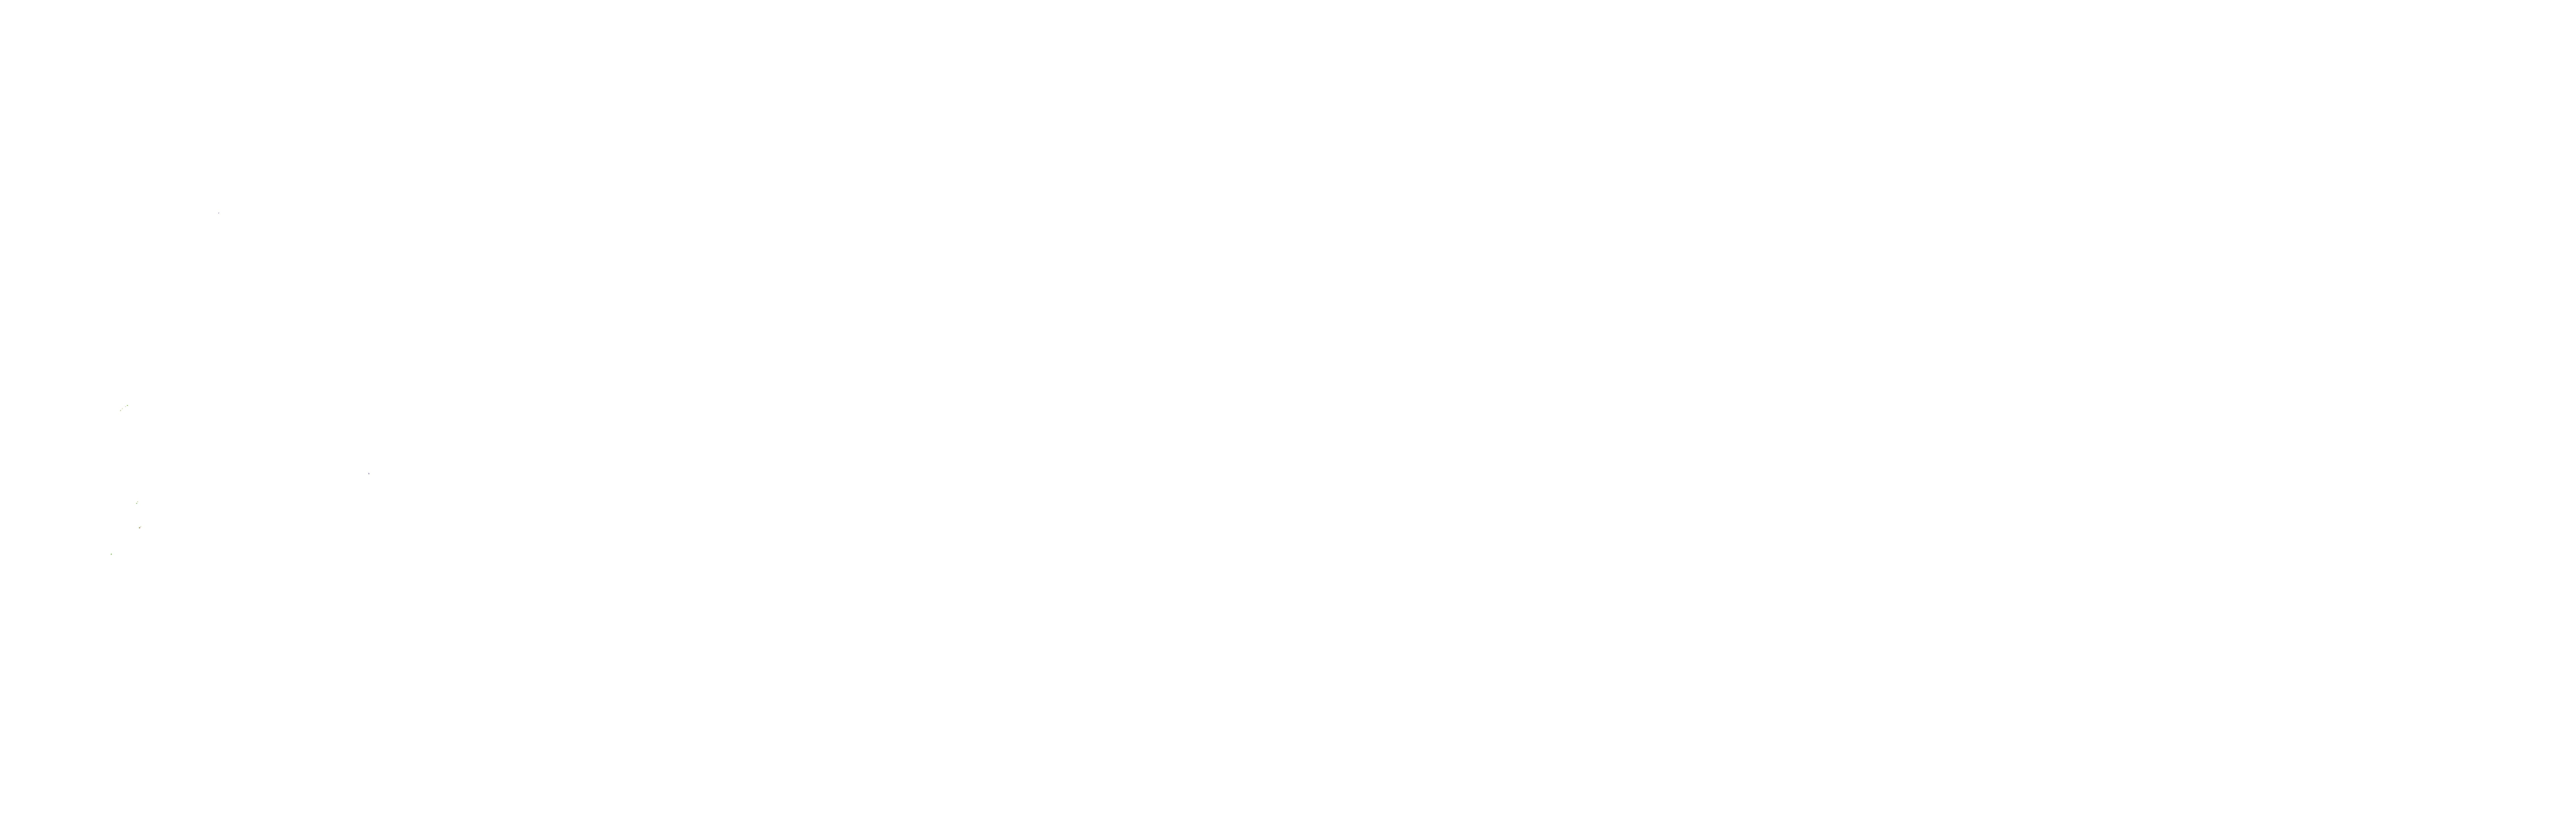 Best-50-logo-White-Transparent